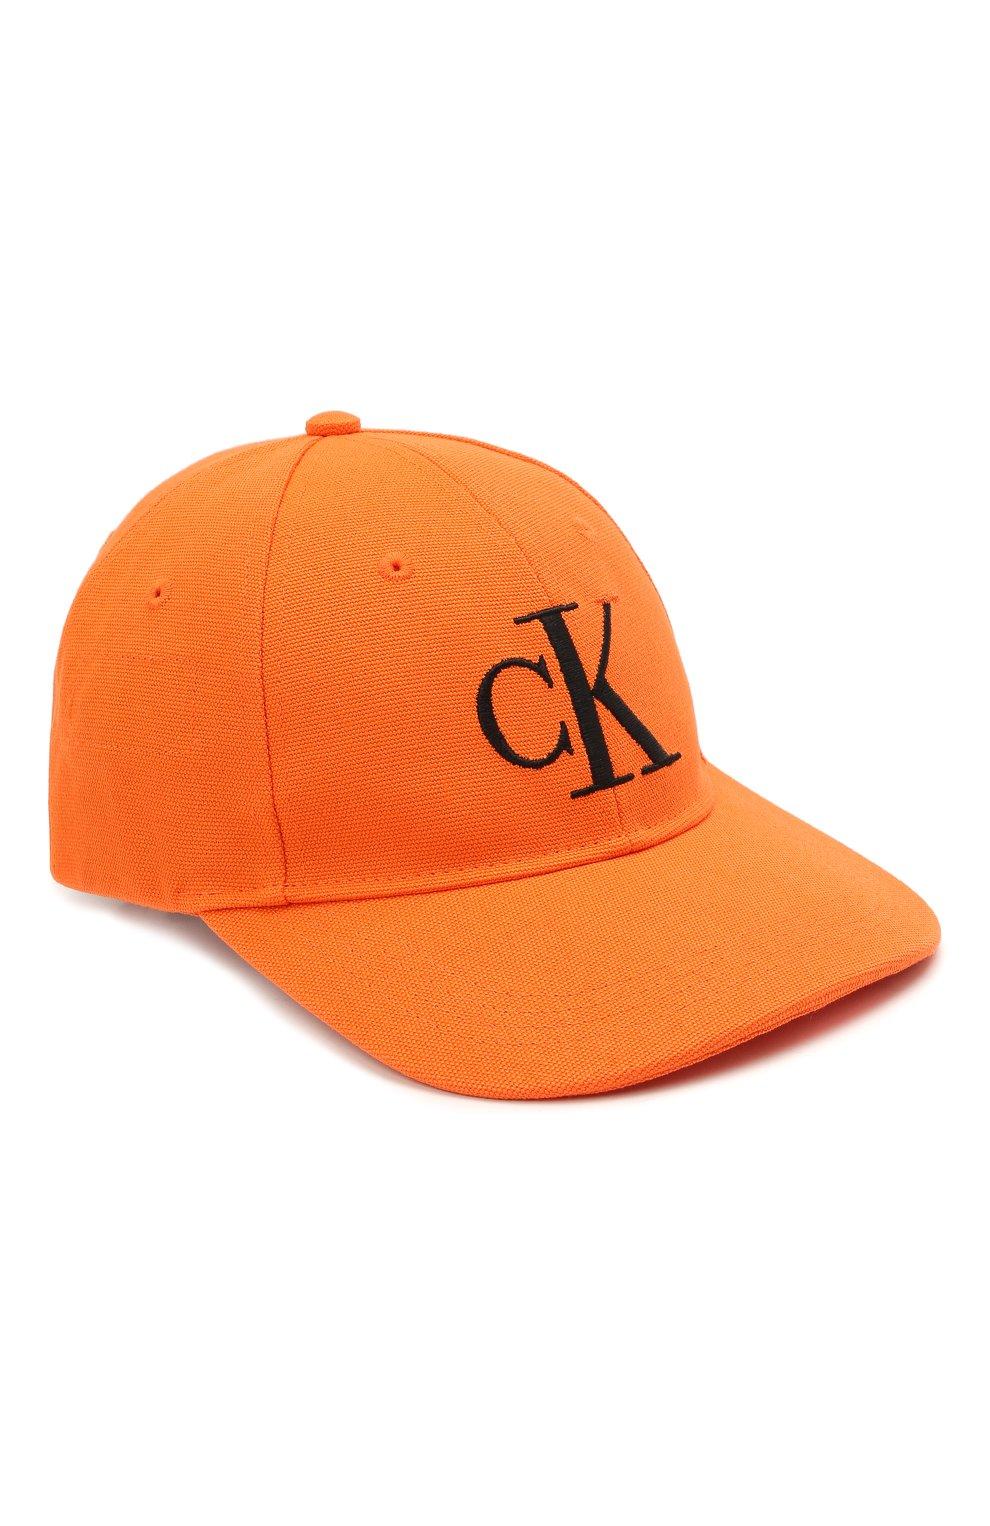 Женская хлопковая бейсболка HERON PRESTON FOR CALVIN KLEIN оранжевого цвета, арт. K50K508122   Фото 1